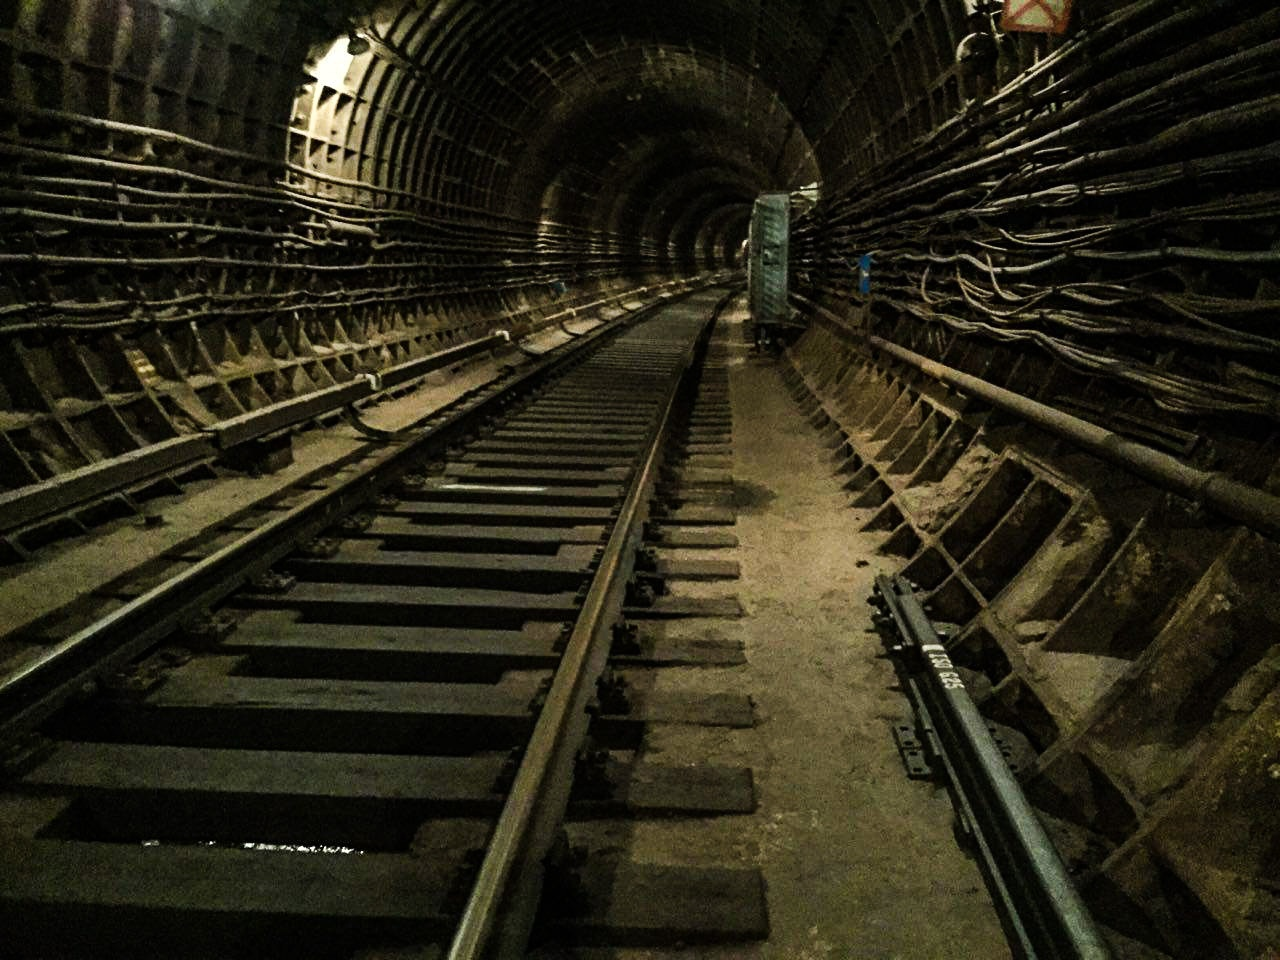 Wi-Fi в метро: архитектура сети и подземные камни - 3